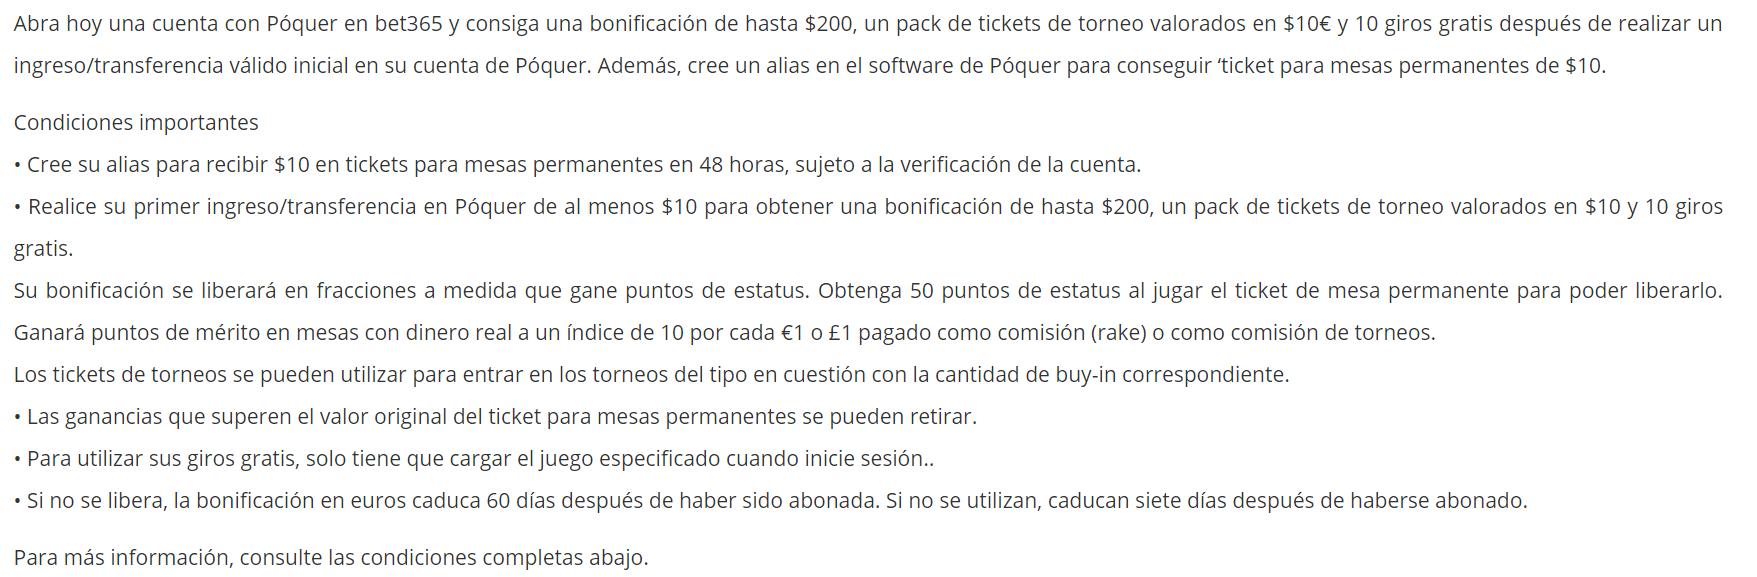 Codigo de bonificacion plus500 torneo gratuito poker-644077